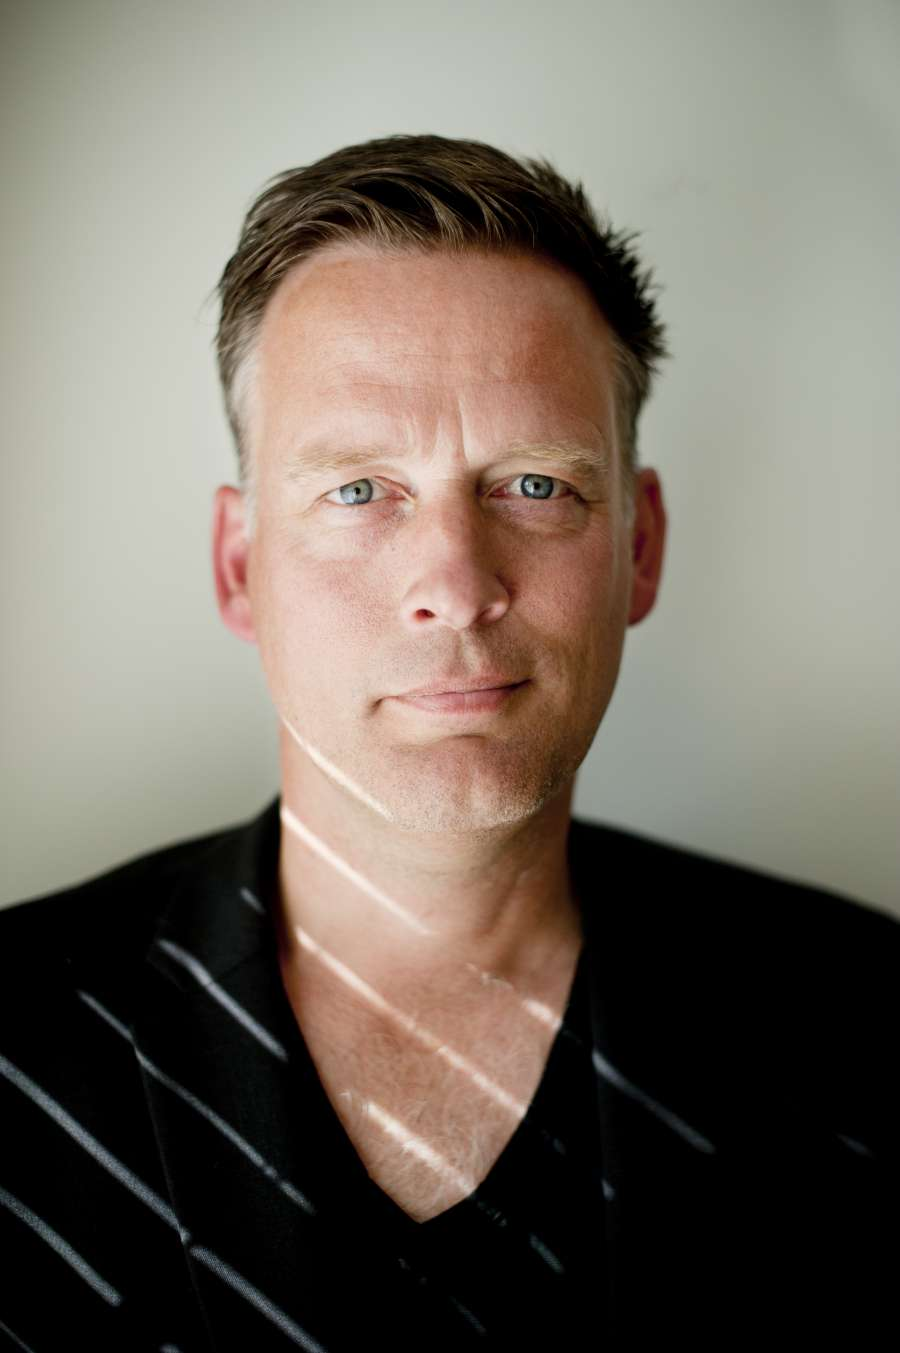 27 mei 2017: Erik Jan Harmens te gast bij Radio L1